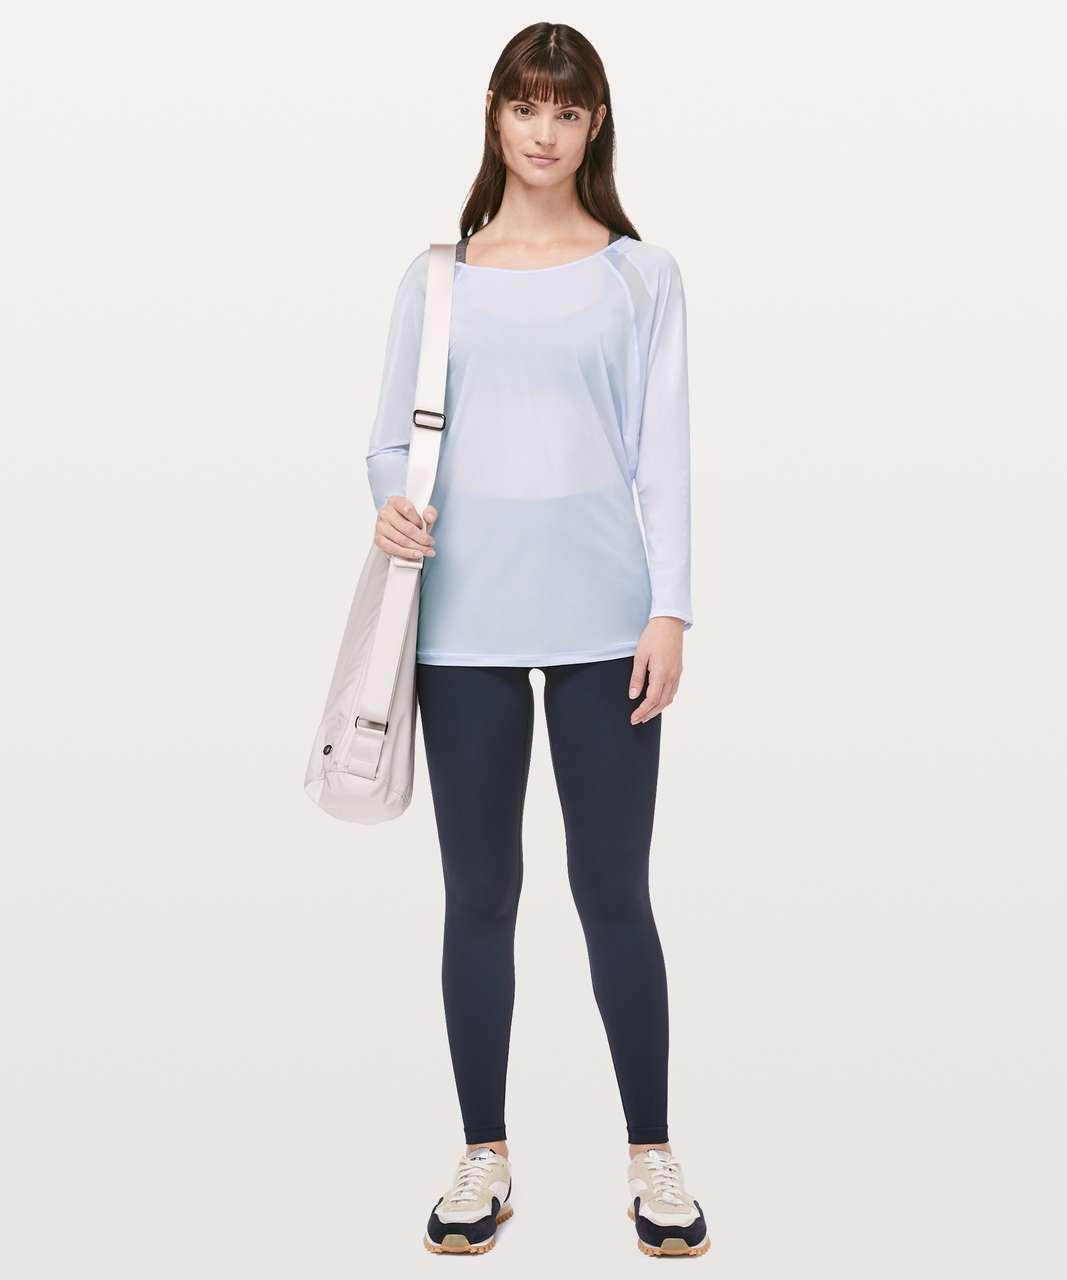 Lululemon If Youre Lucky Long Sleeve Tee - Serene Blue